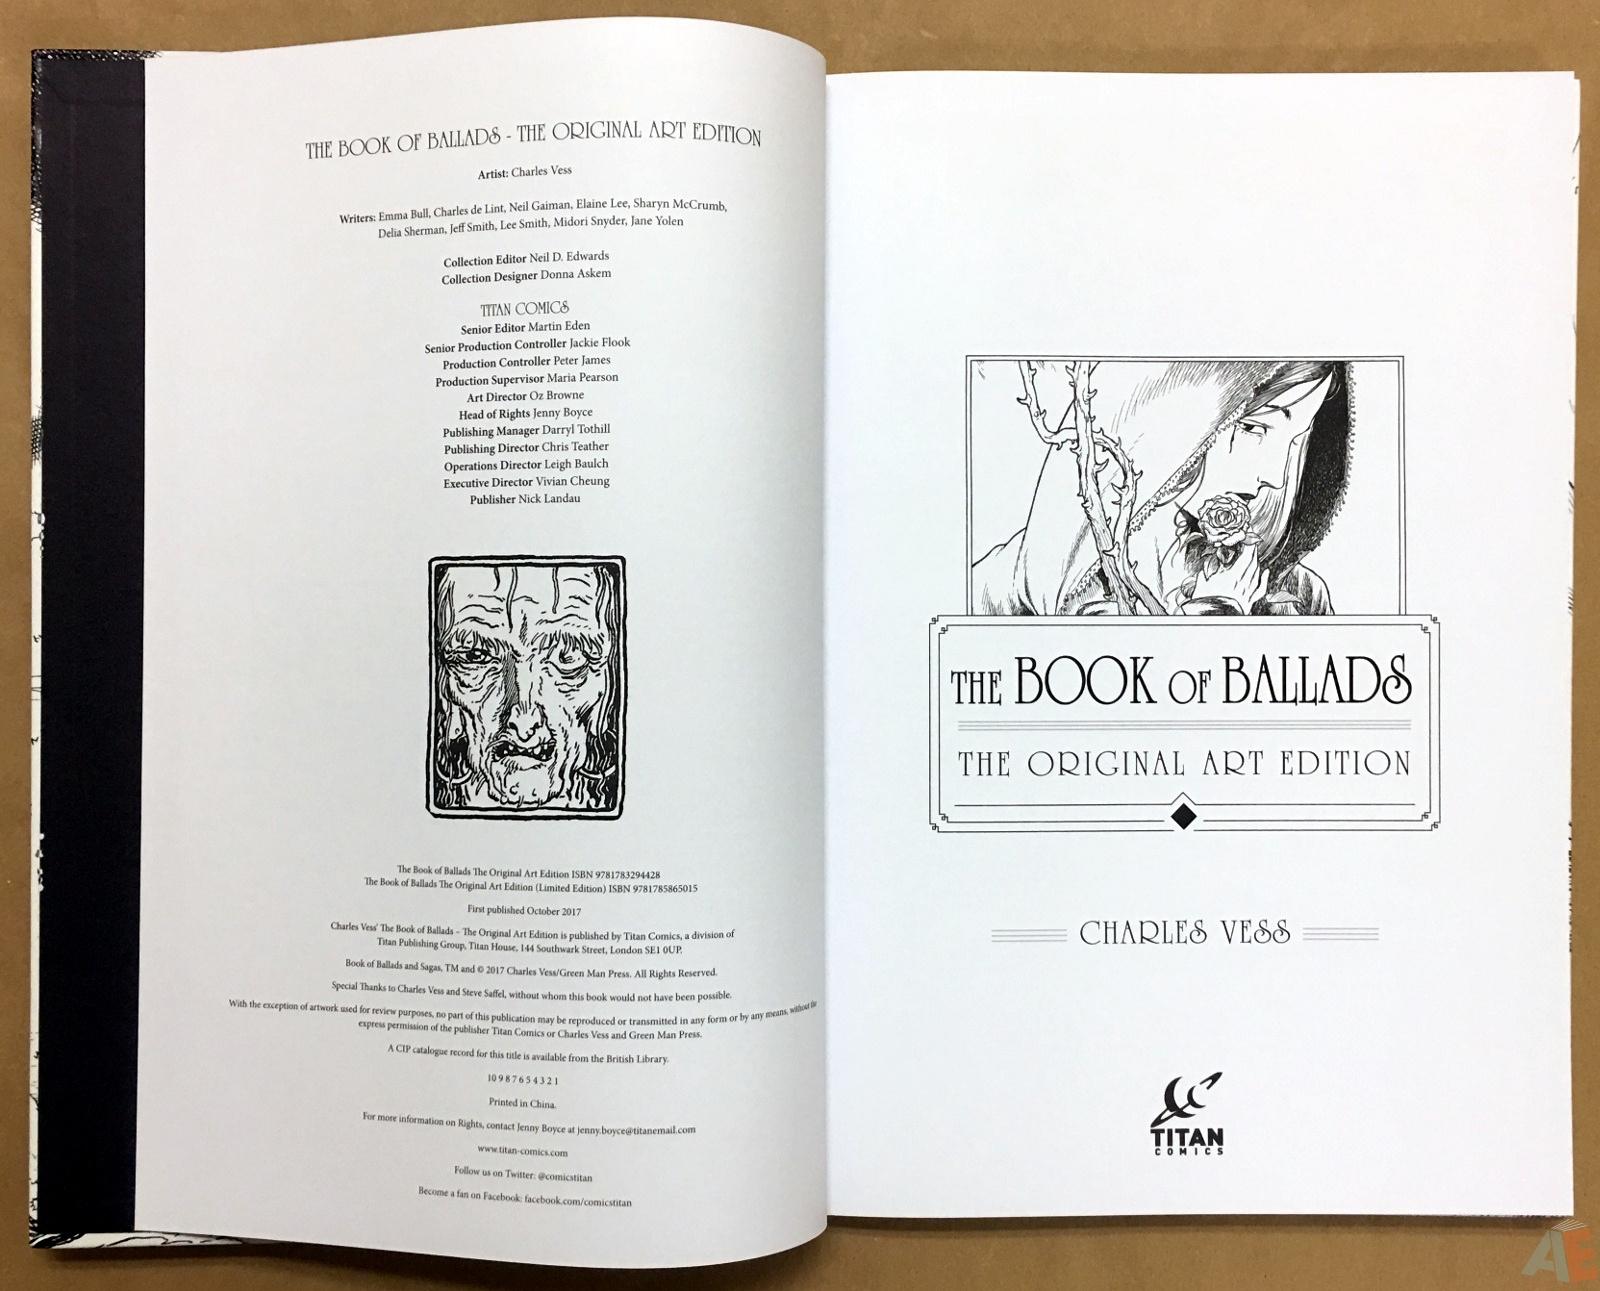 The Book Of Ballads, The Original Art Edition 4